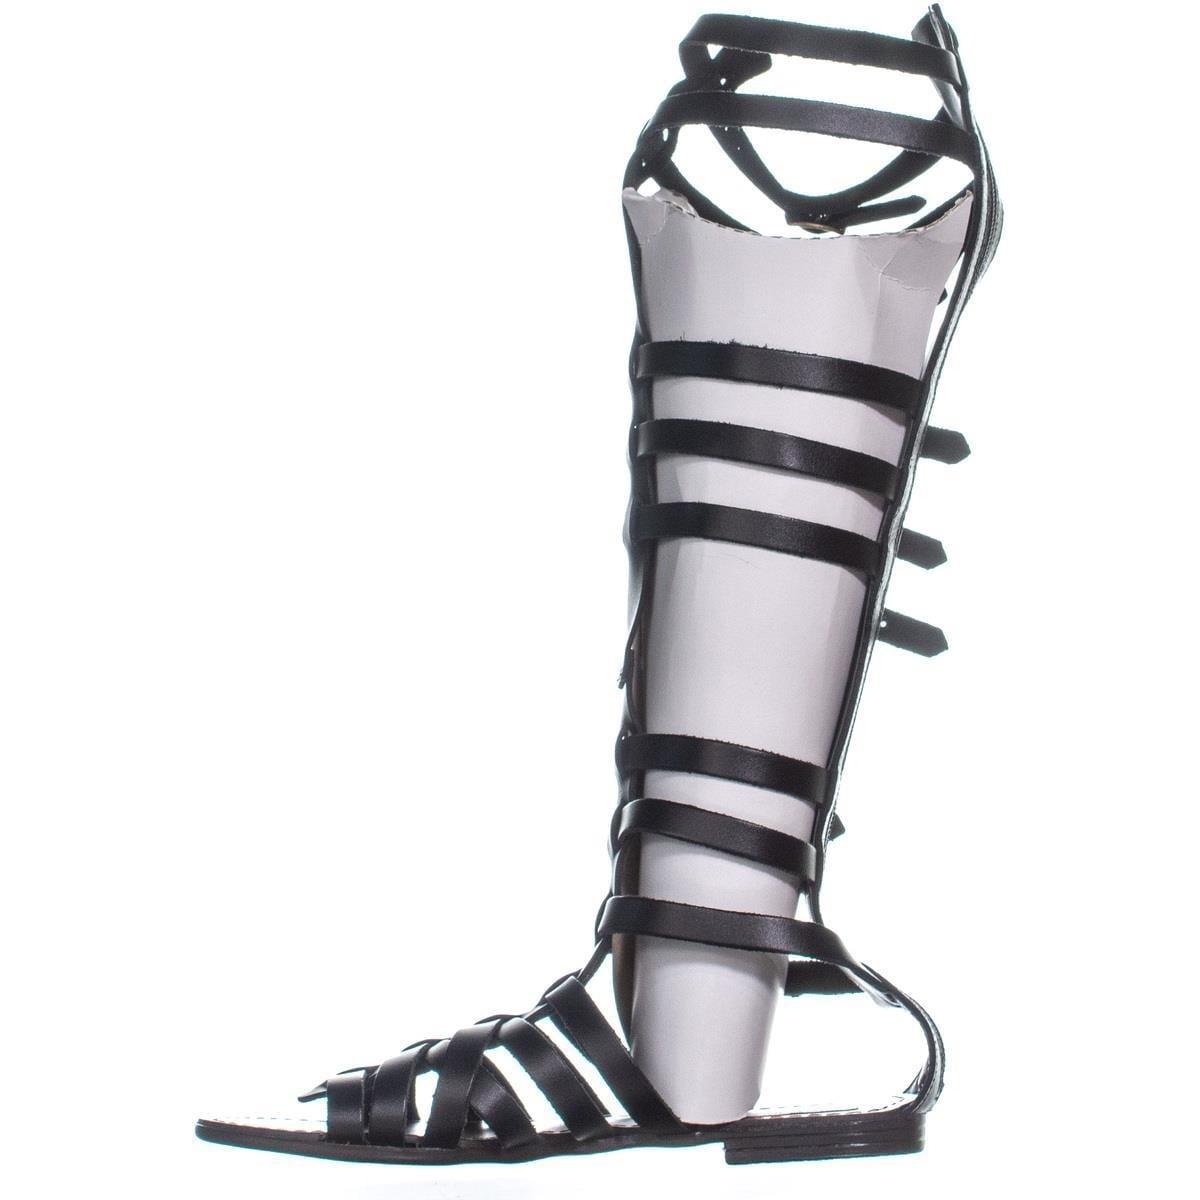 35ae0ac10fd Shop Steve Madden Sparta Gladiator Sandals